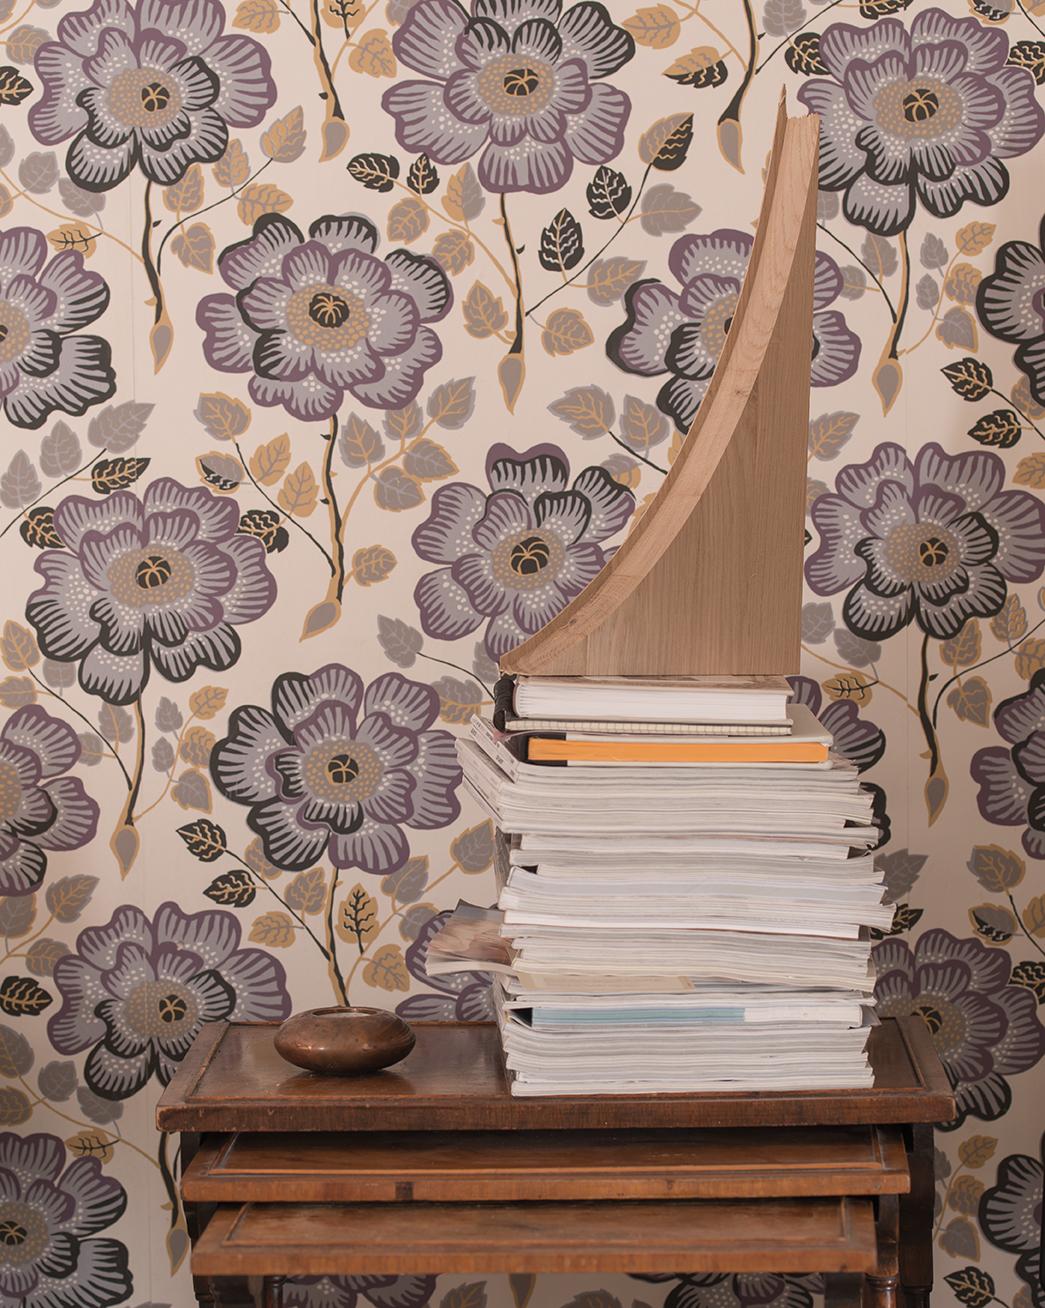 wood_swallows_tail_furniture_design_sculpture_04